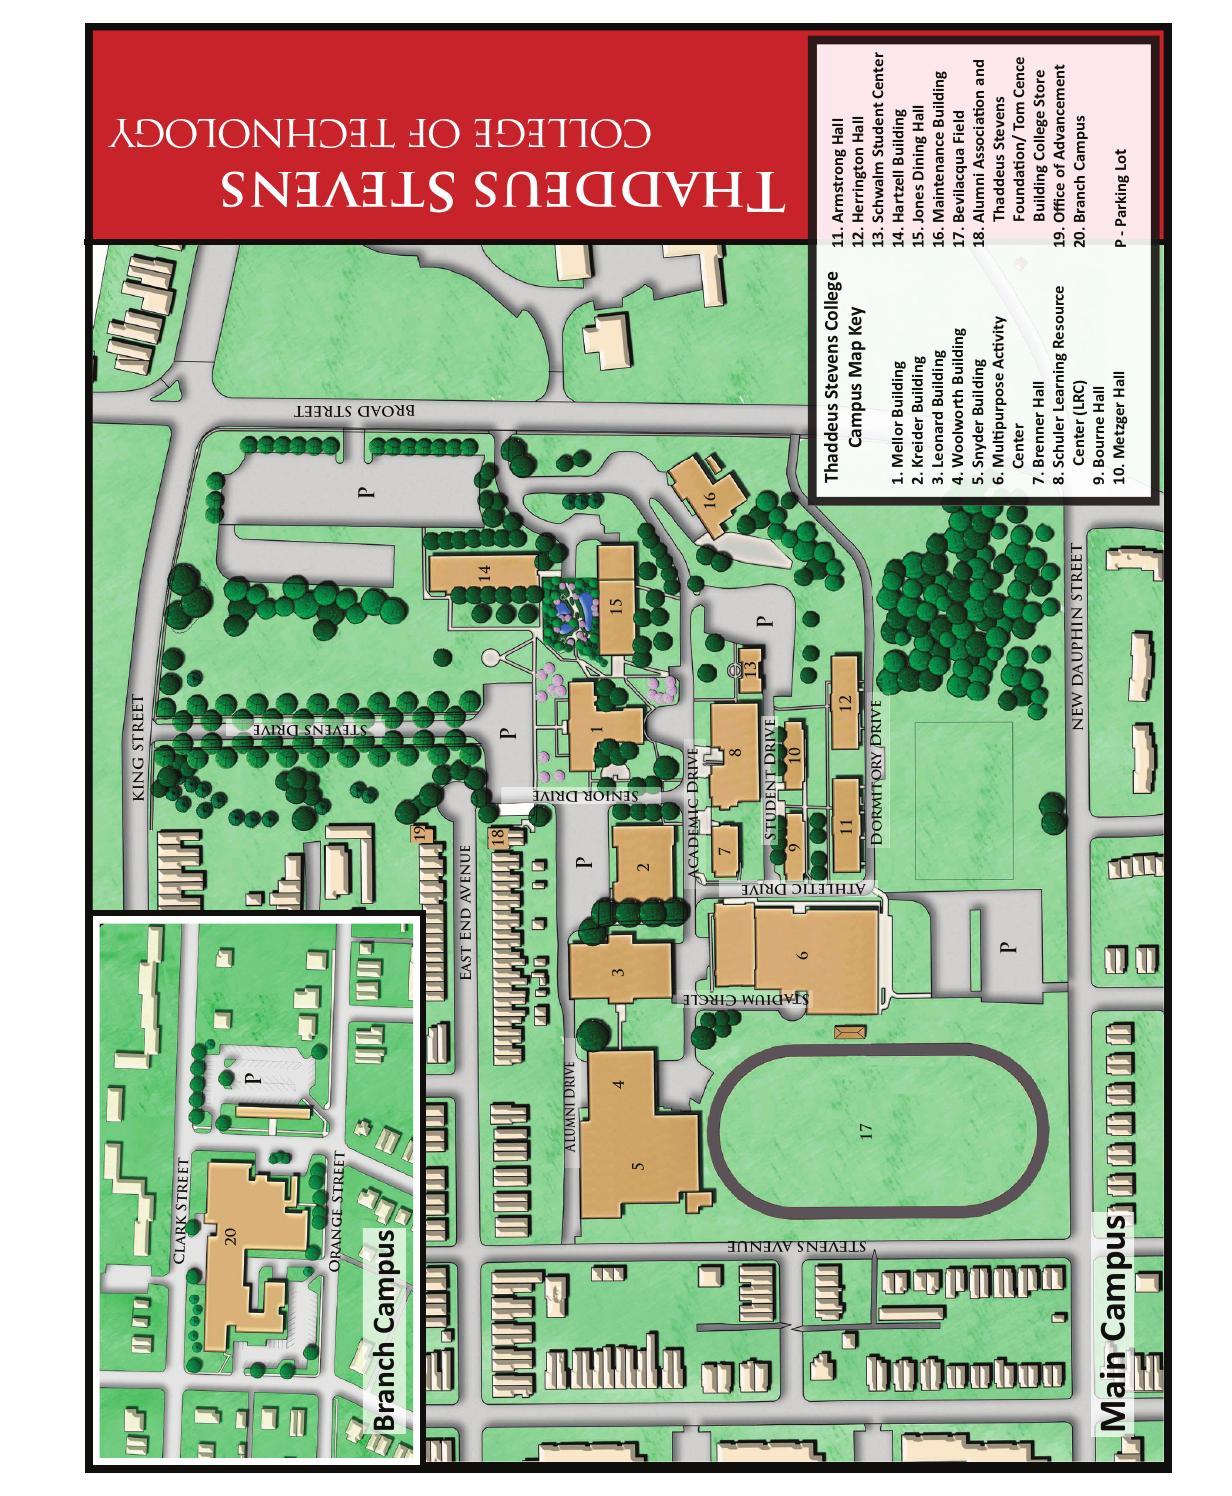 Thaddeus Stevens College 2013 14 Student Handbook By Thaddeus